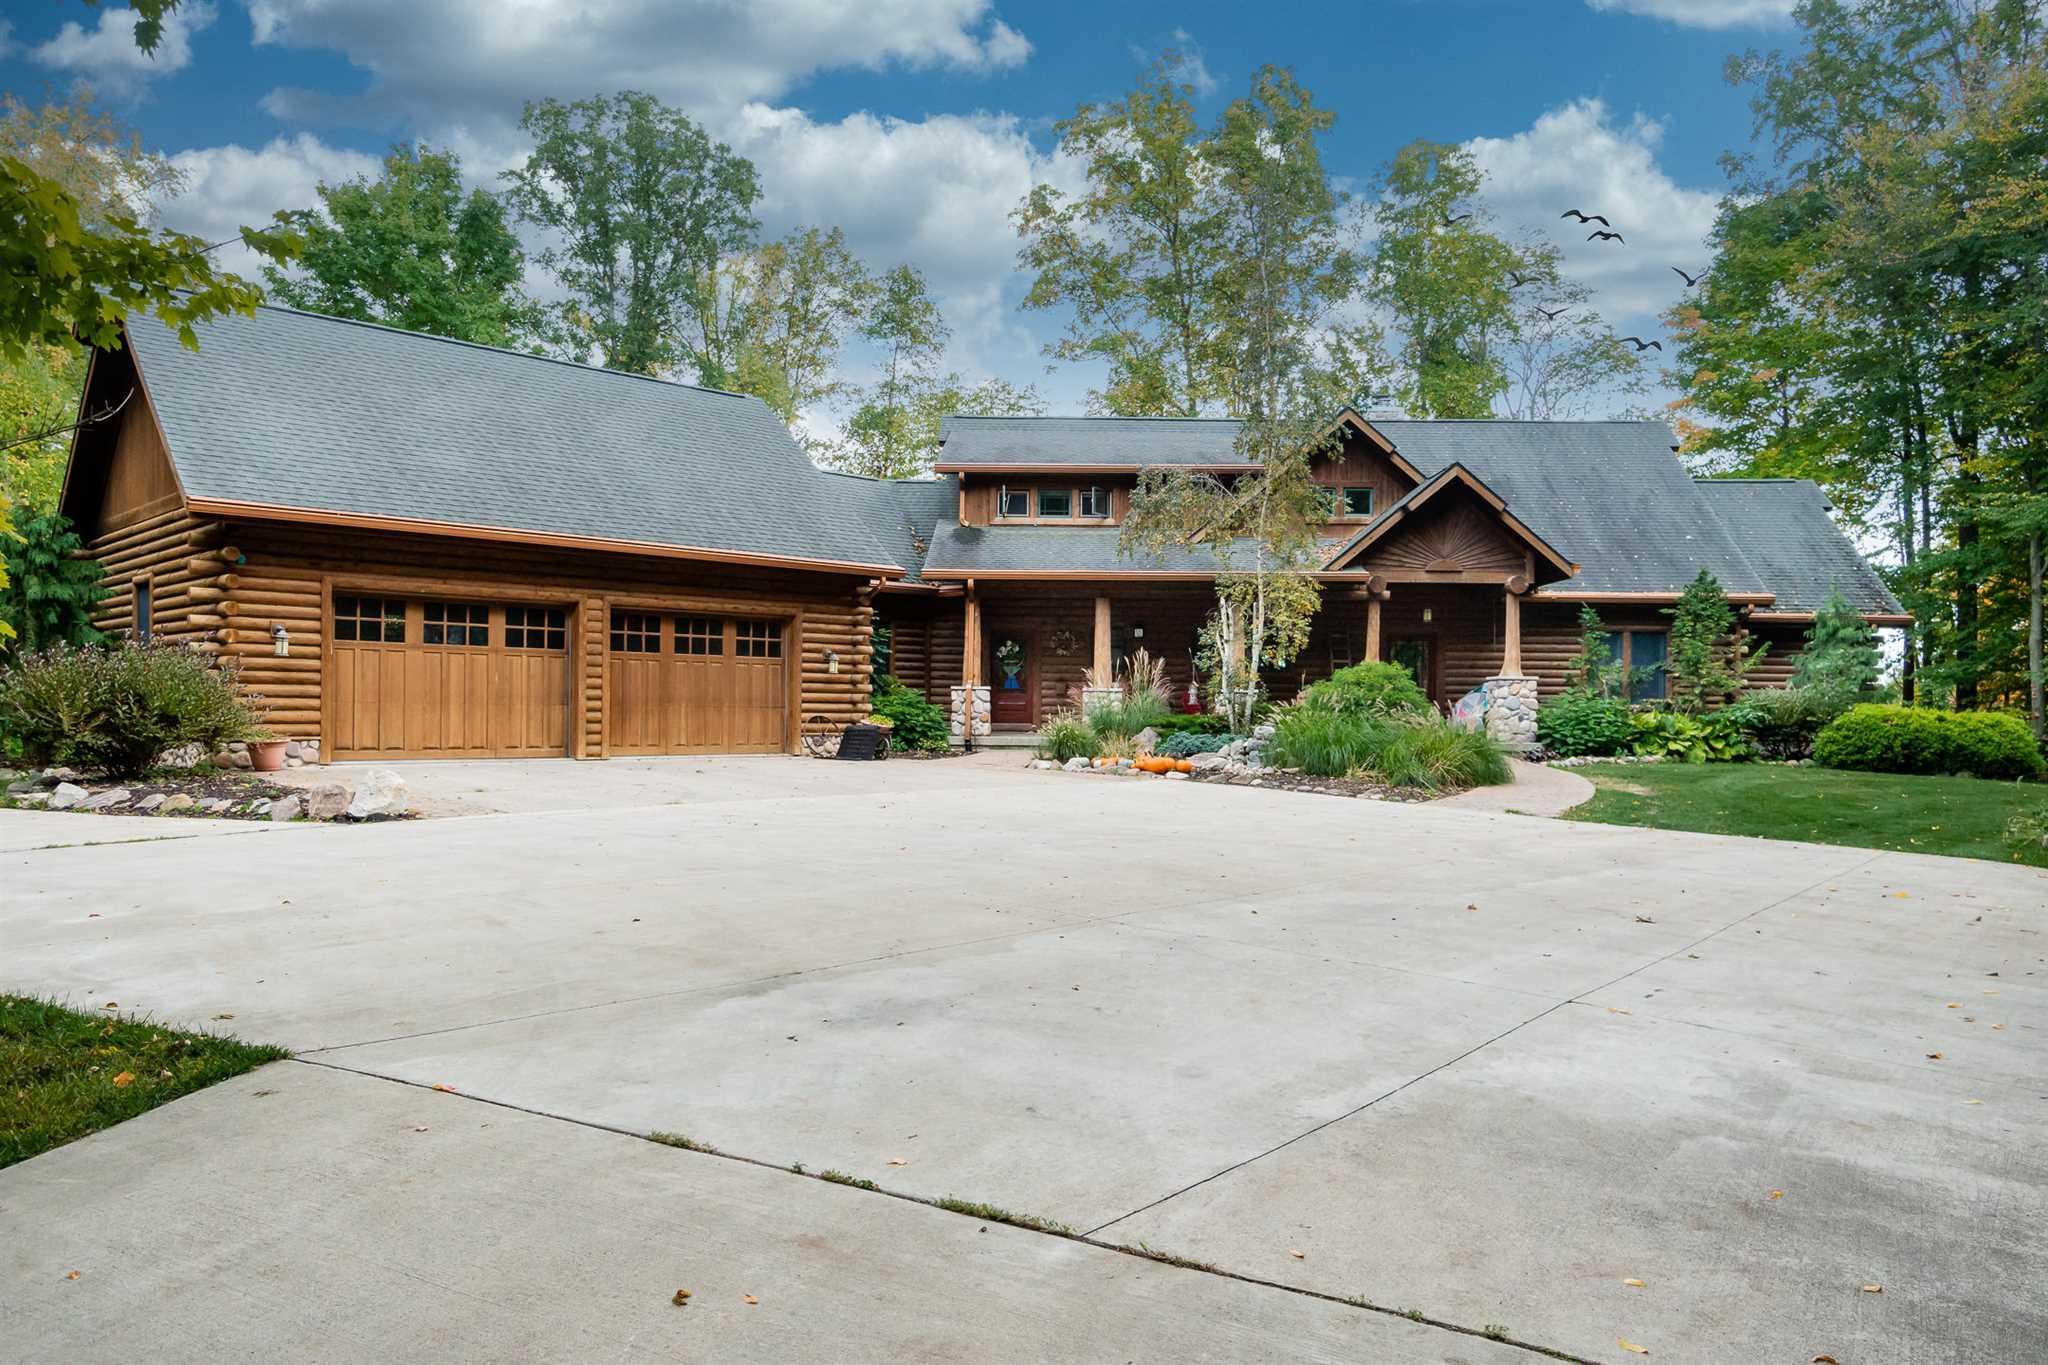 4381 N 500 E, Kendallville, IN 46755